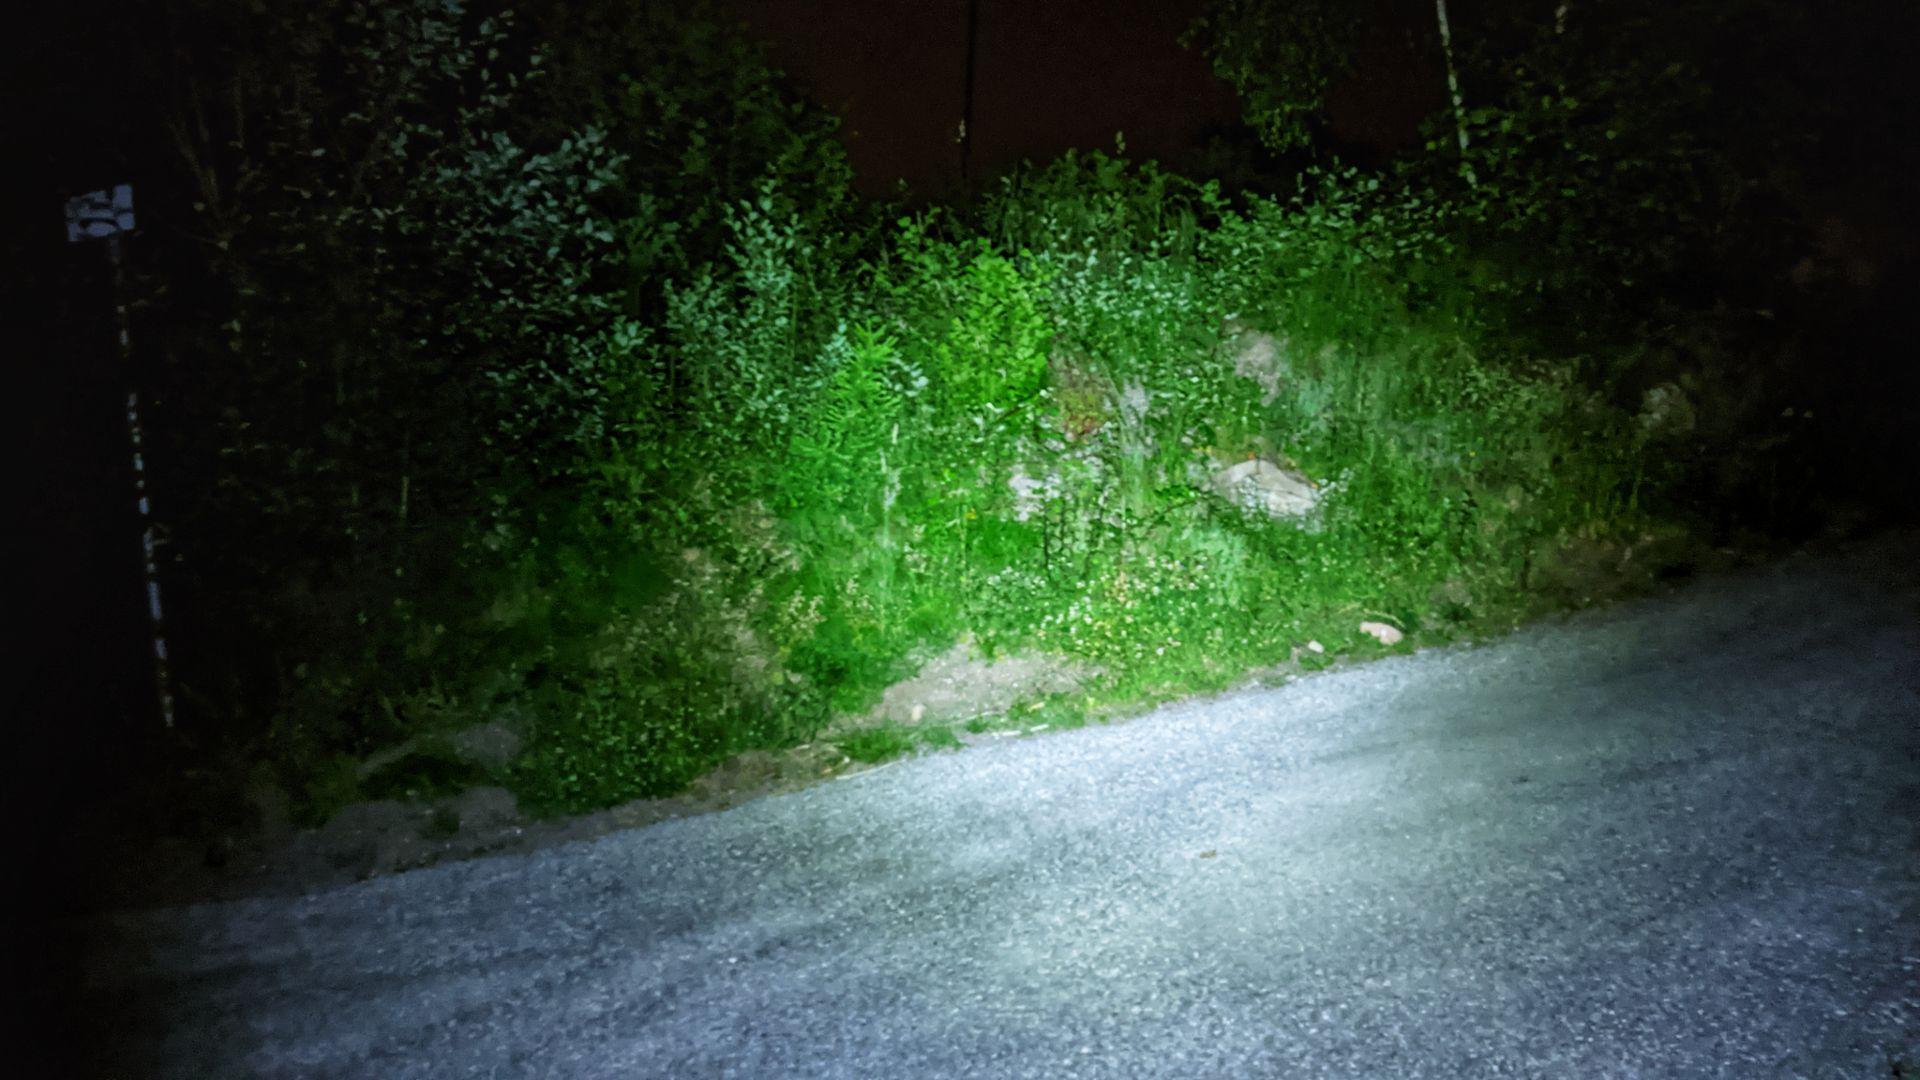 acebeam_E70_flashlight_Review_21700_XHP_70_maxgearedc.com_EDC_GEAR_OUTDOOR_TESTING_and_SHORT_REVIEWS_21